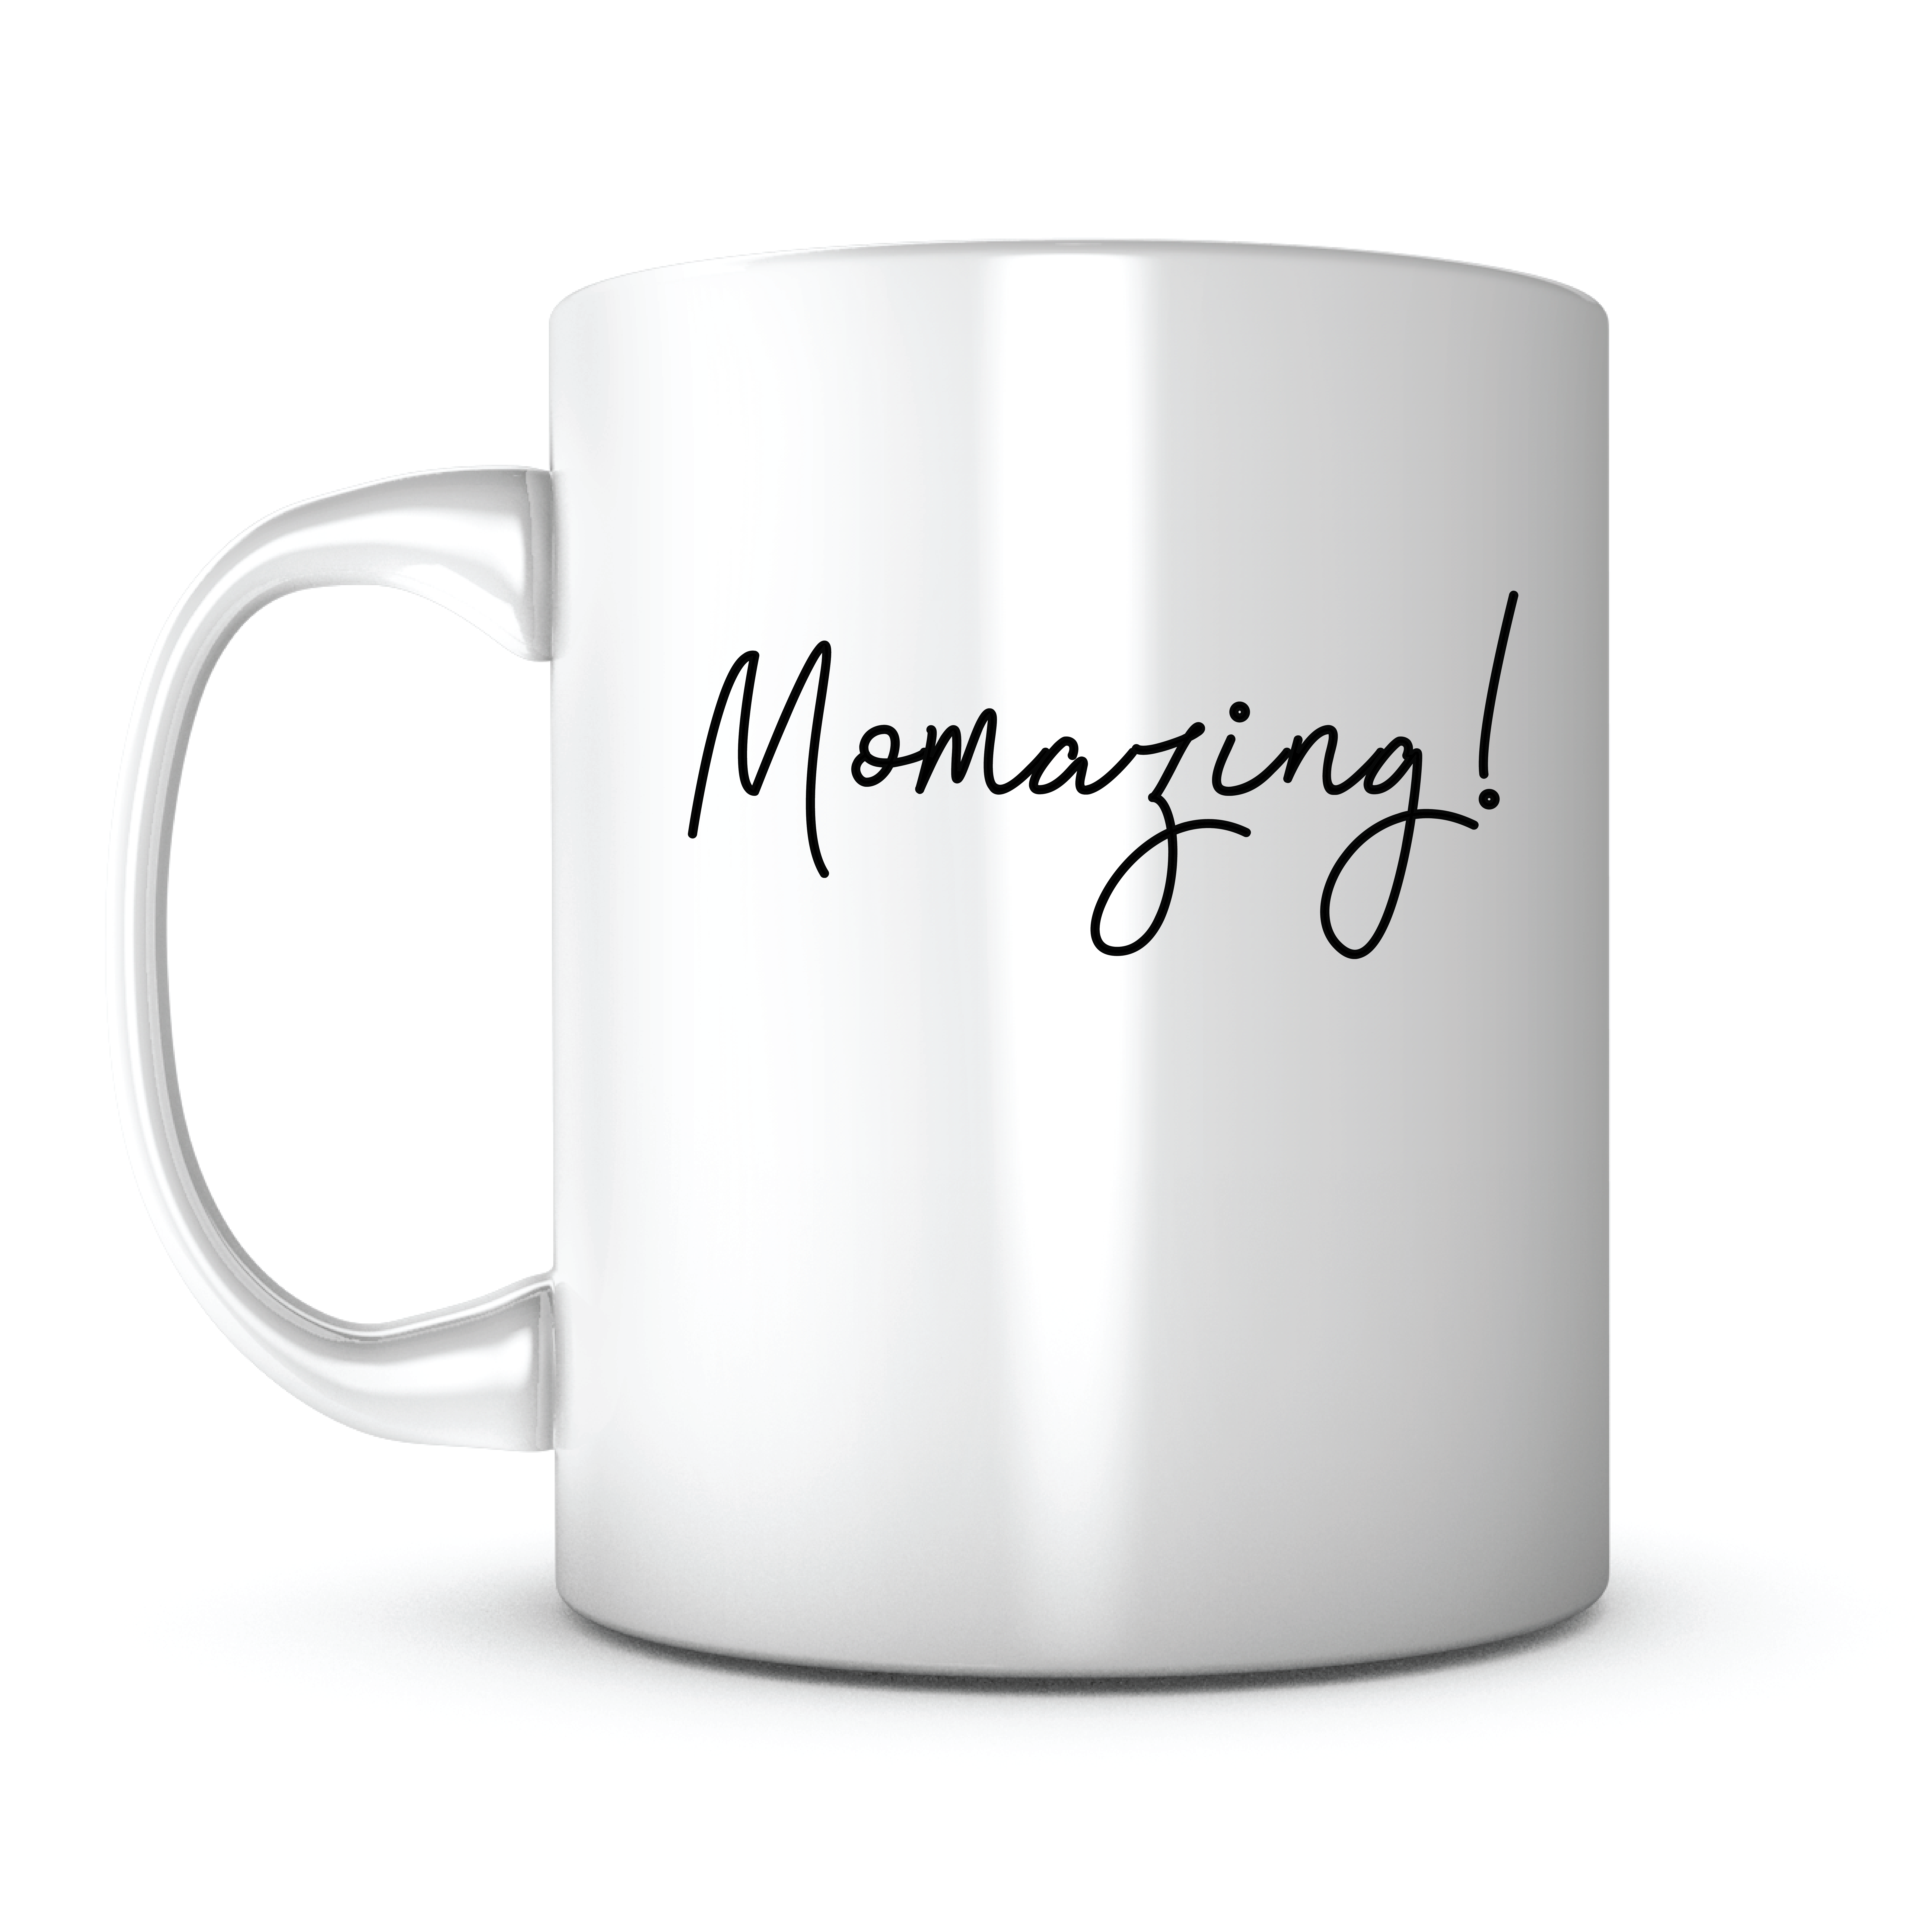 """Momazing!"" Mug in 2020 Mugs, Gifts in a mug, Mom mug"